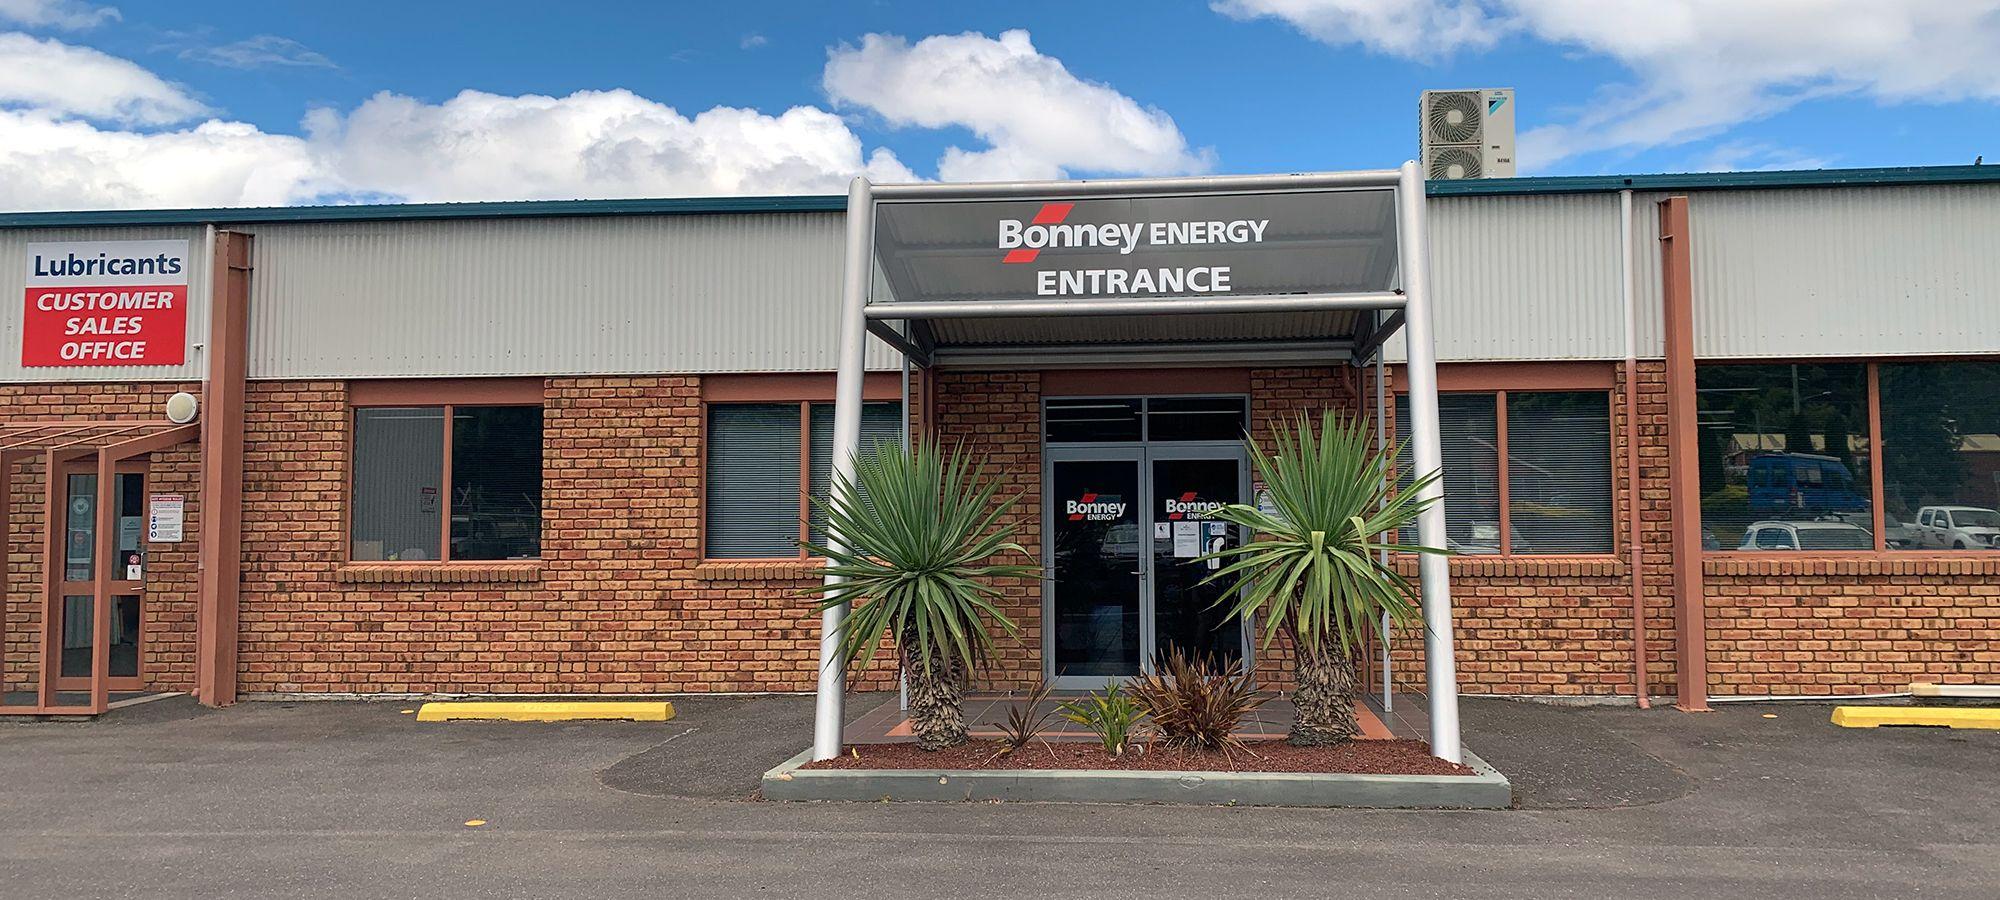 Bonney Energy